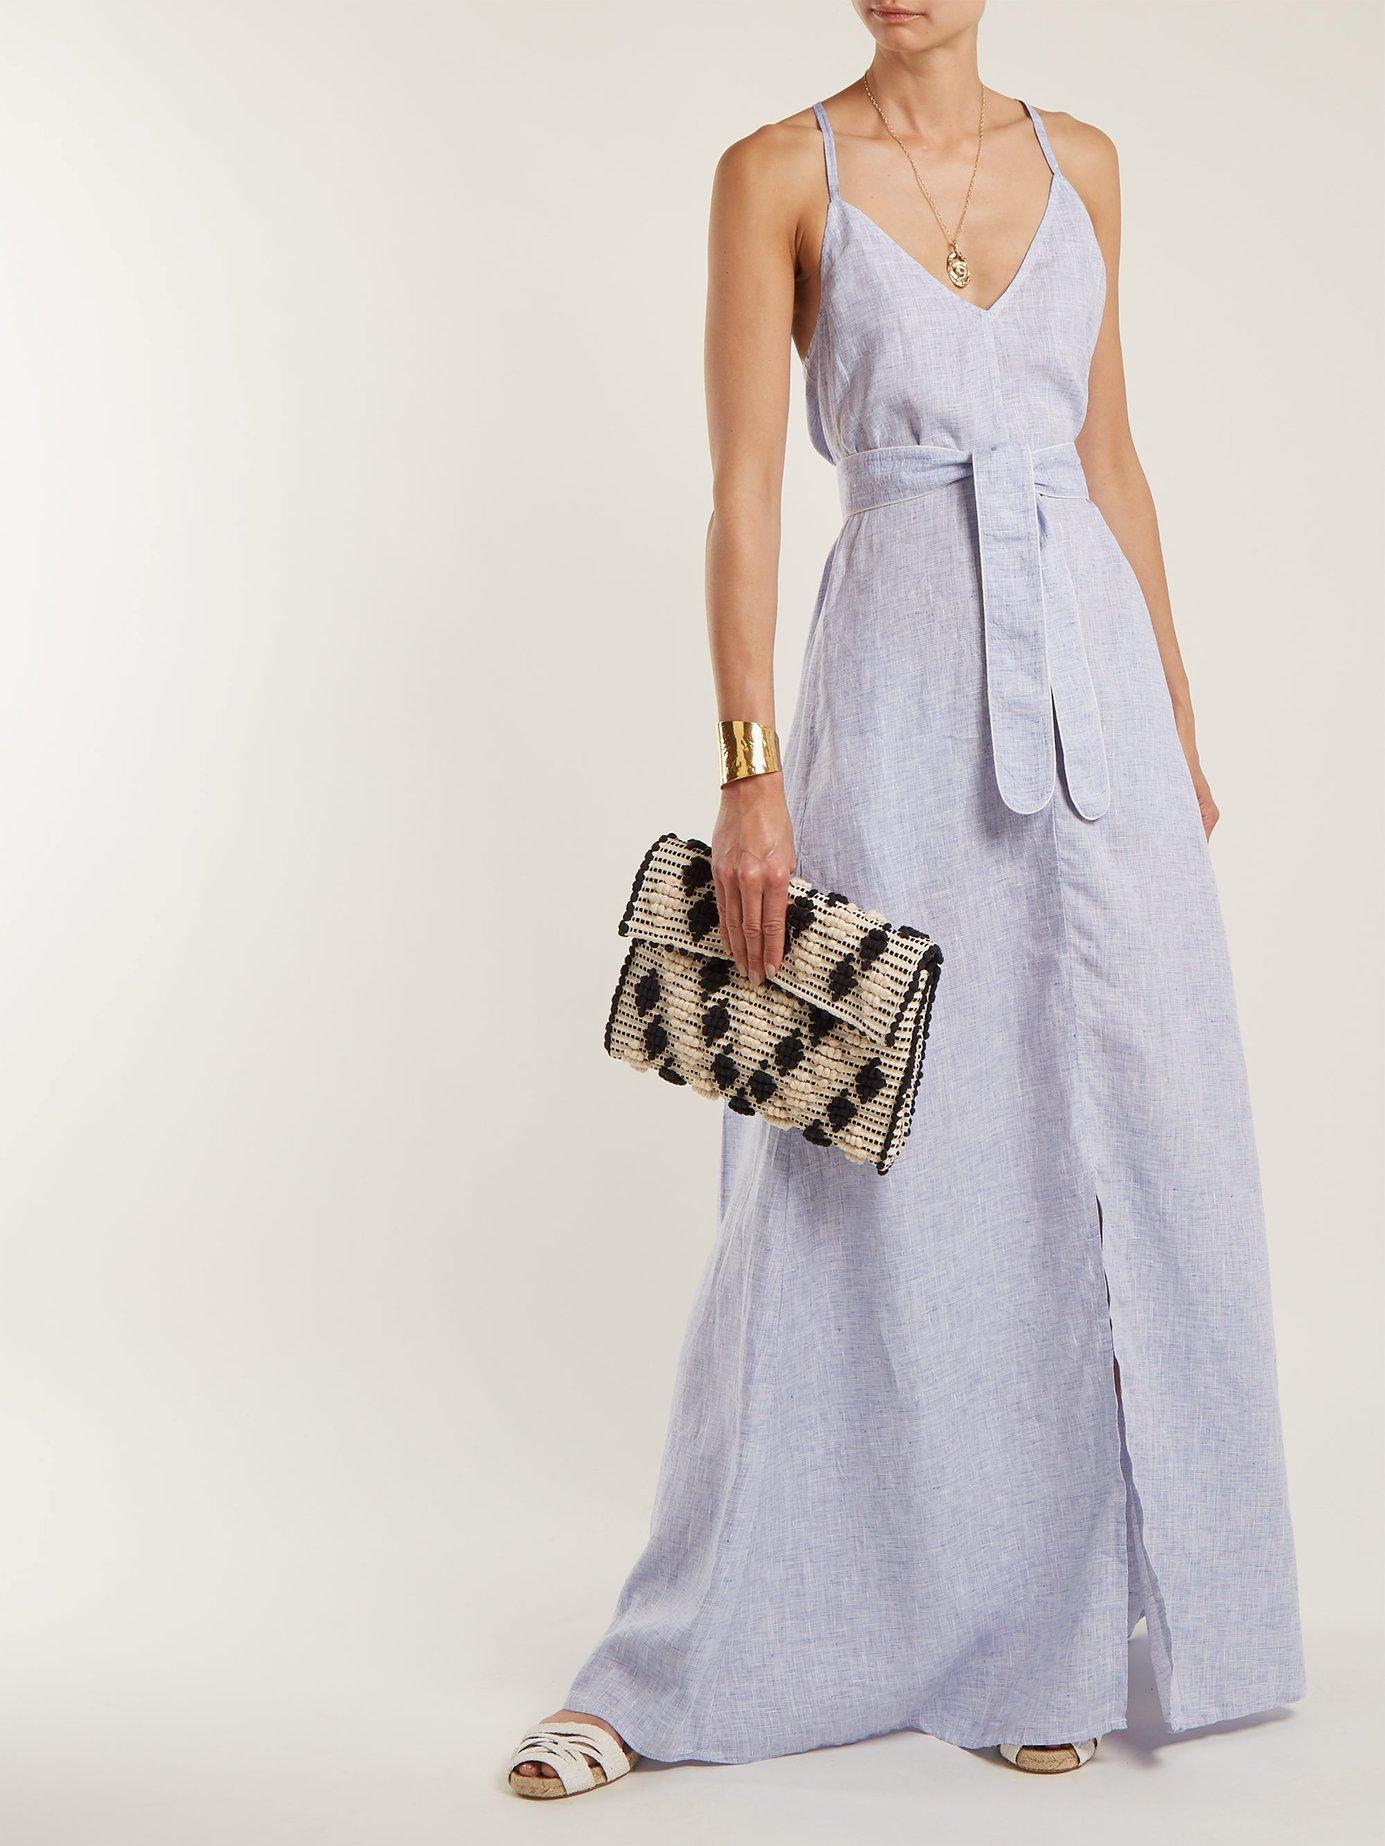 Marina linen maxi dress by Wiggy Kit